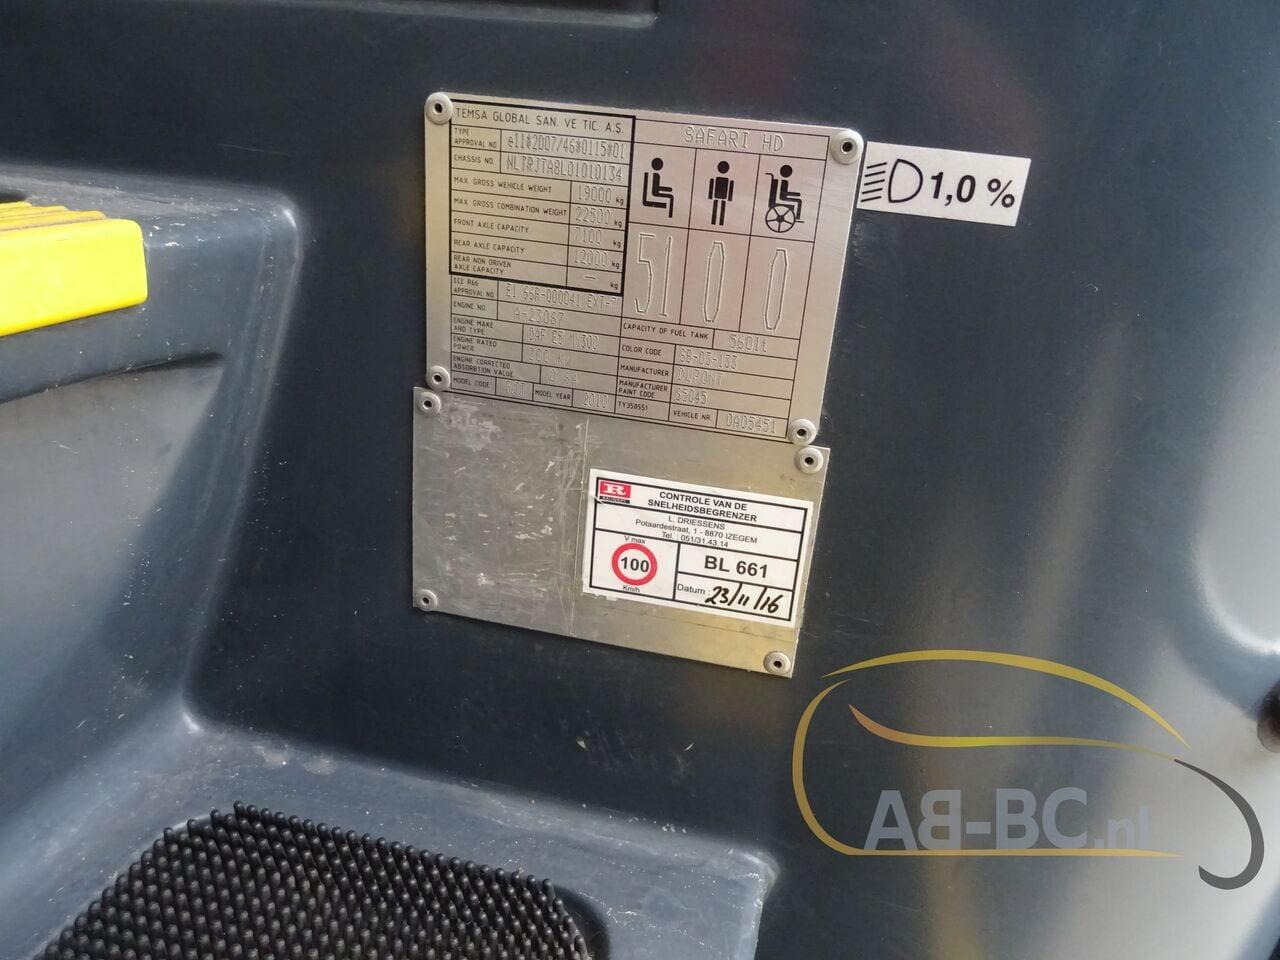 coach-busTEMSA-Safari-HD-51-Seats-EURO5-12-MTR---1614266466365507449_big_0a99be1361df708beb3ca1c73f20dd4f--19052917224730818200